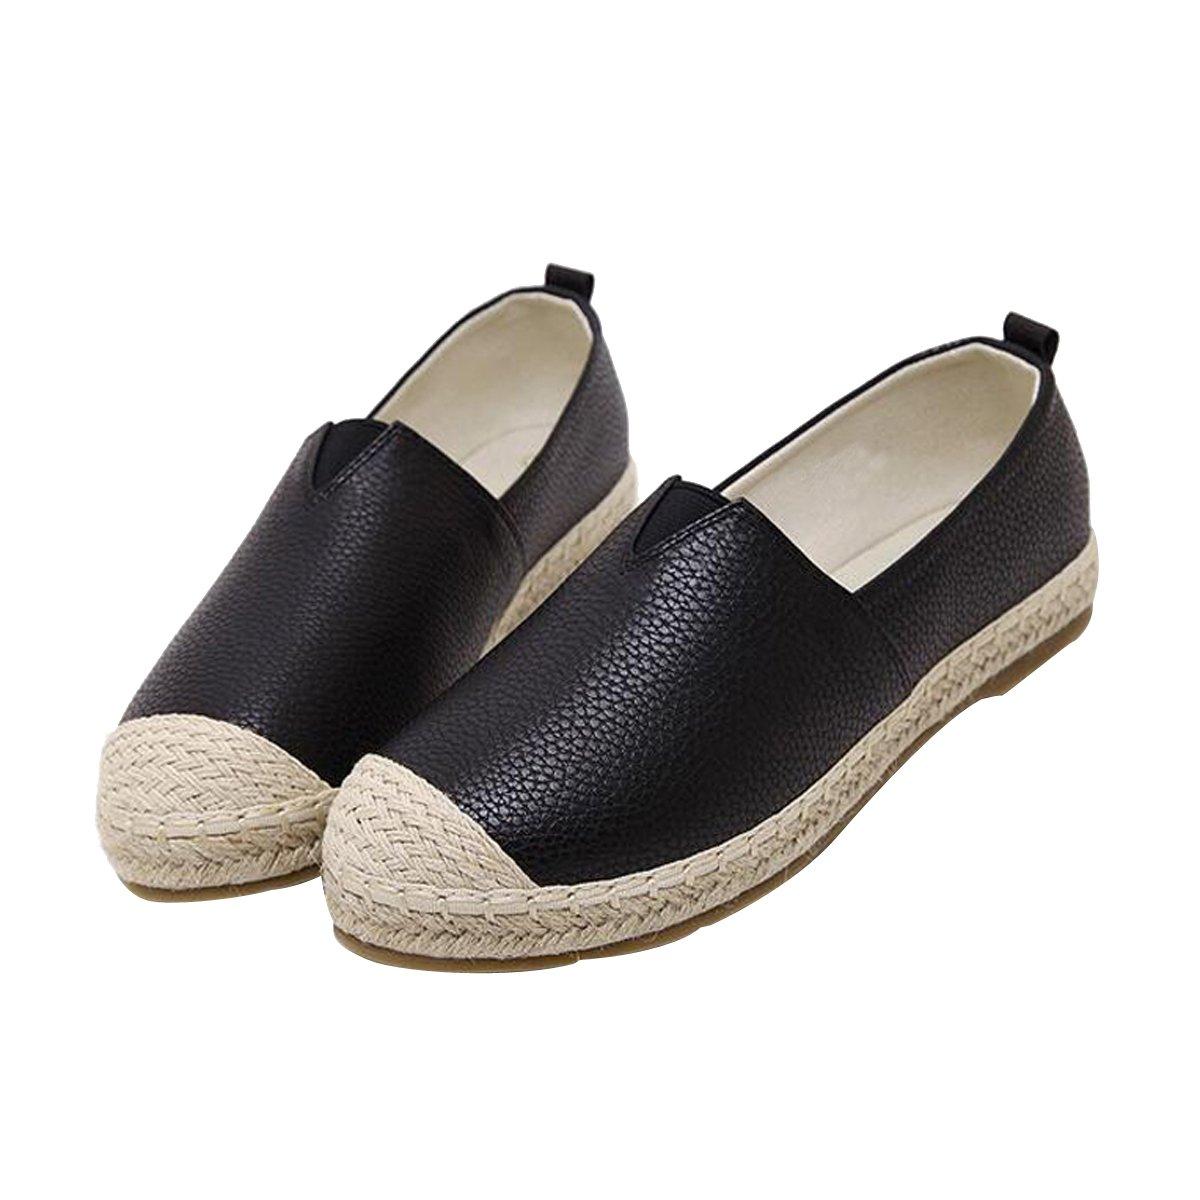 VFDB Slip On Espadrilles Casual Women Loafers Flat Shoes Black 37